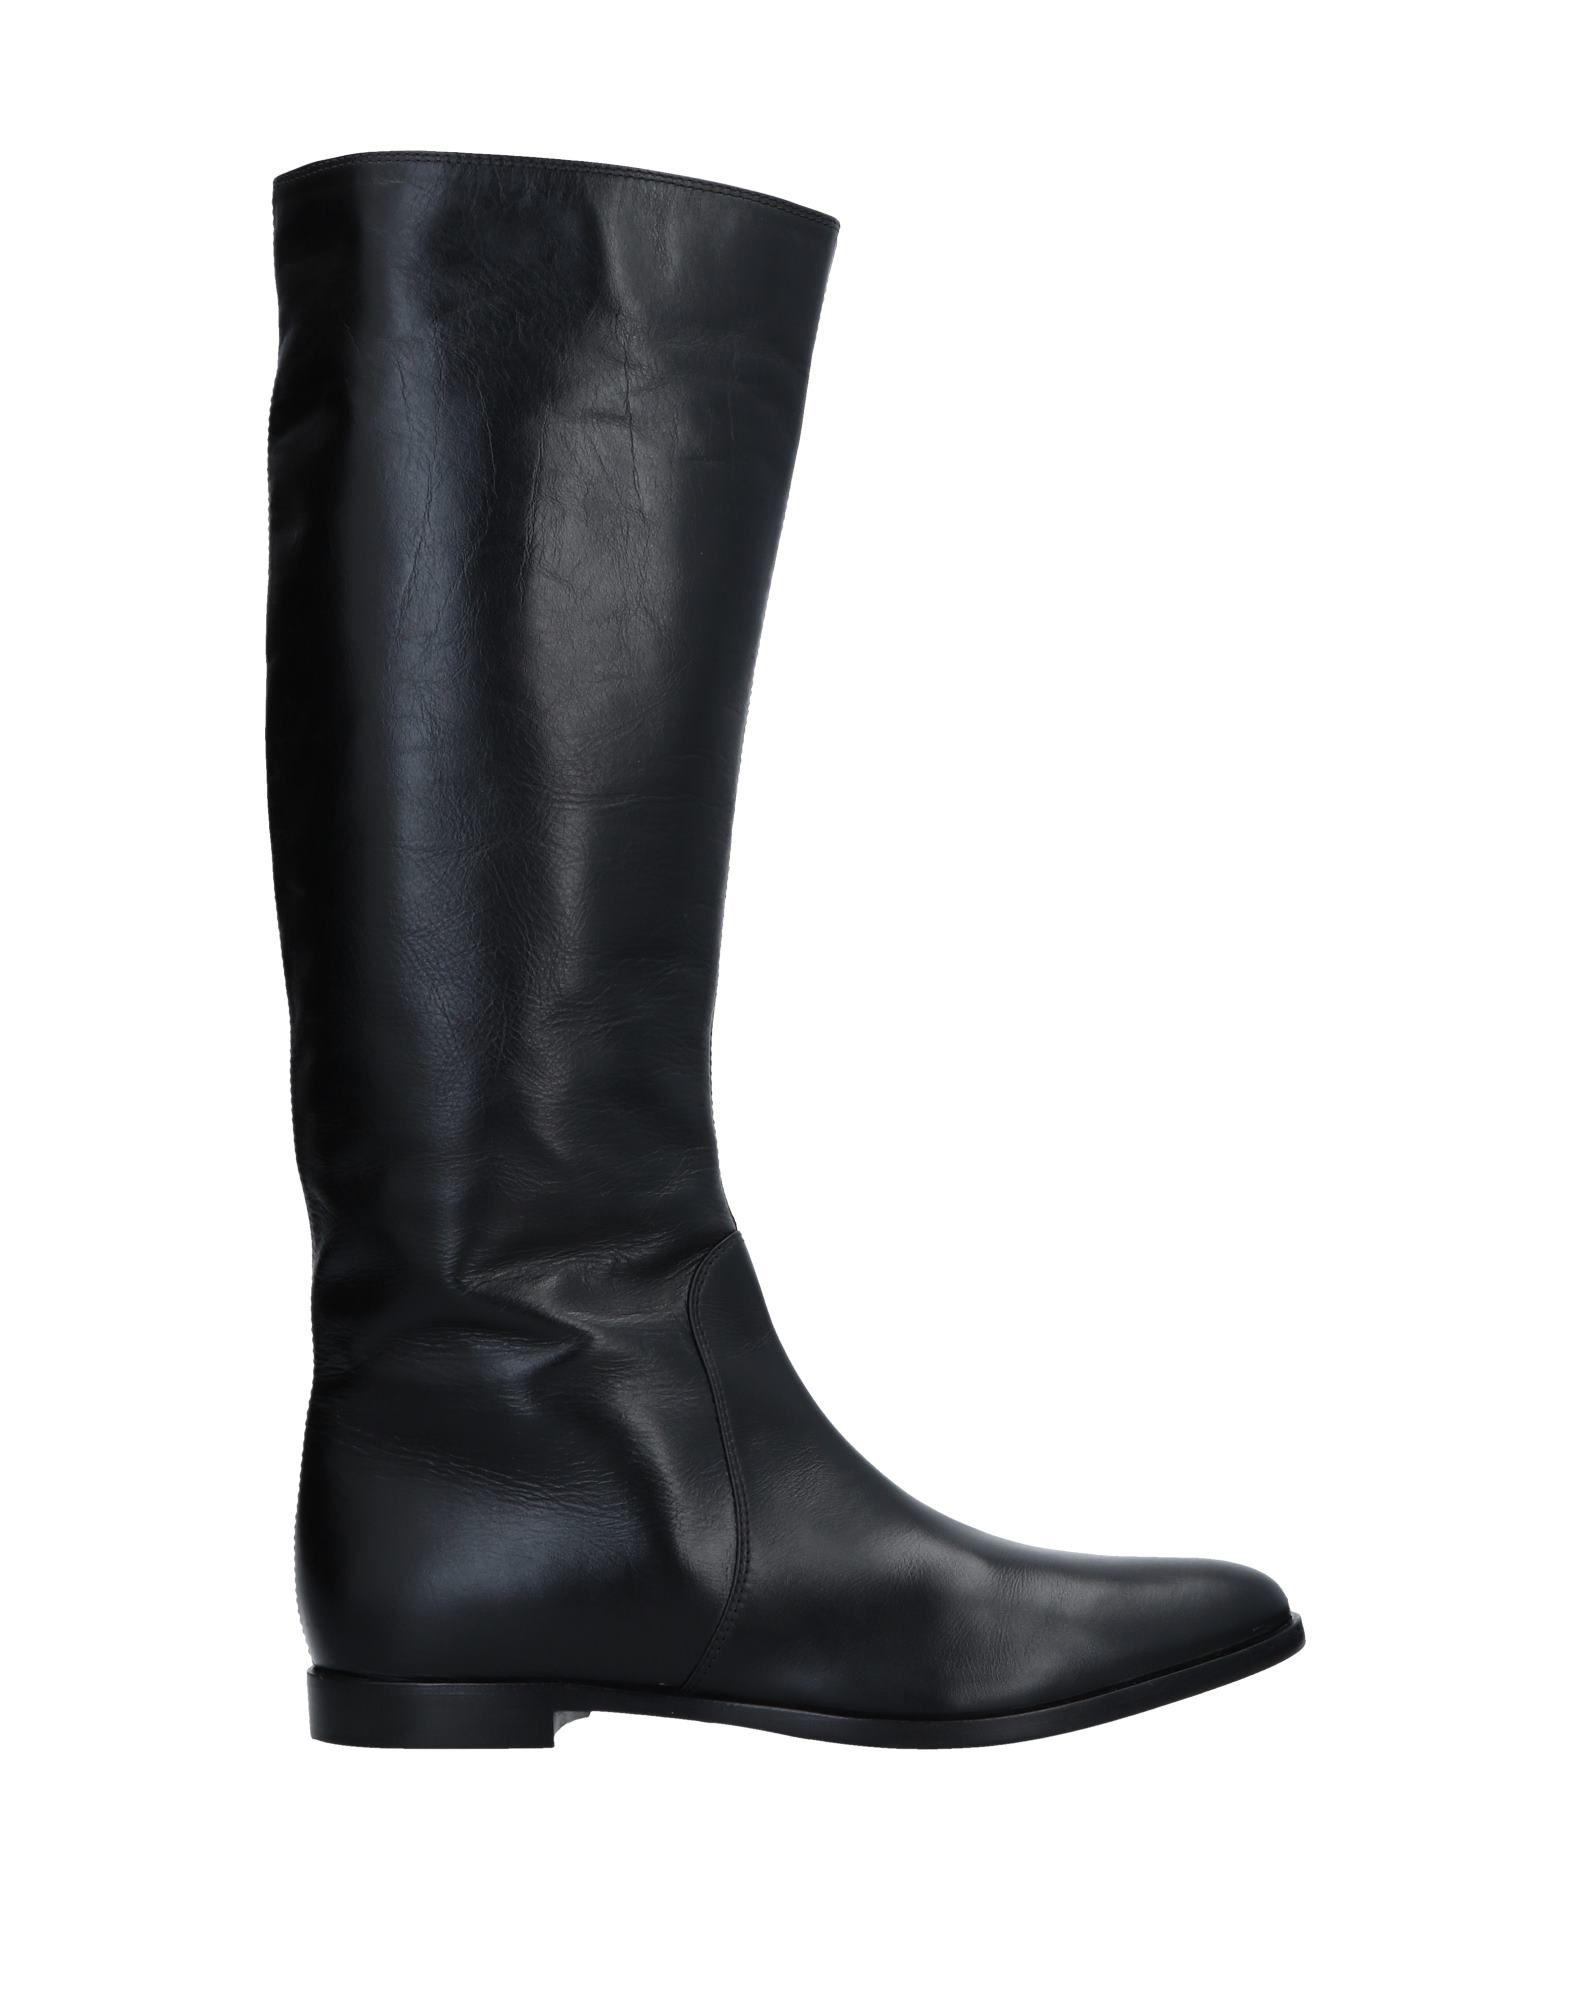 Sergio Rossi Rossi Boots - Women Sergio Rossi Rossi Boots online on  Australia - 11525879WJ b39d80